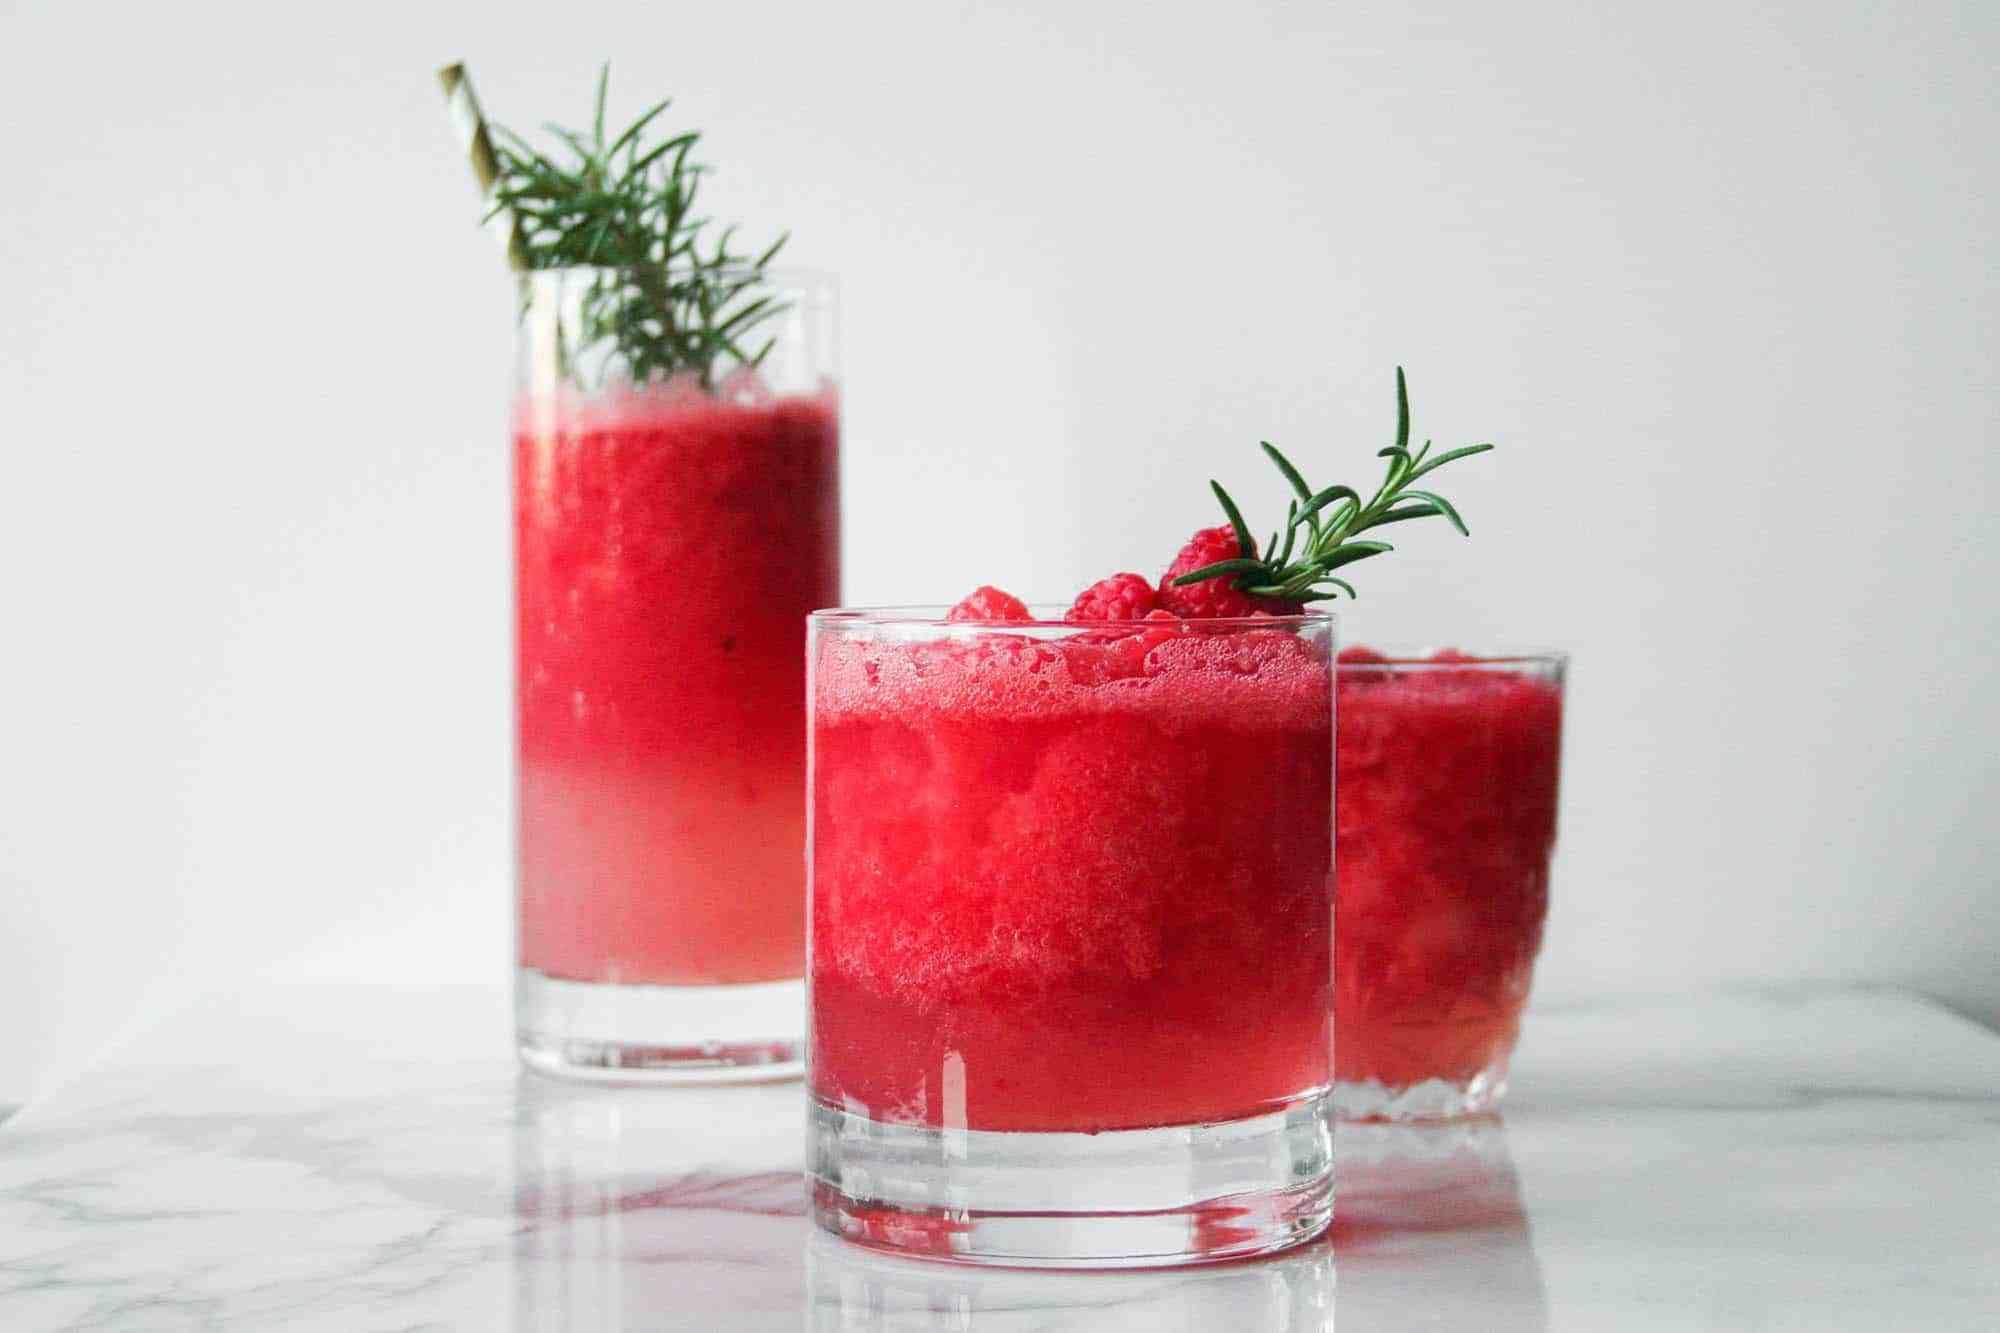 3-Way Frozen Watermelon Cocktails